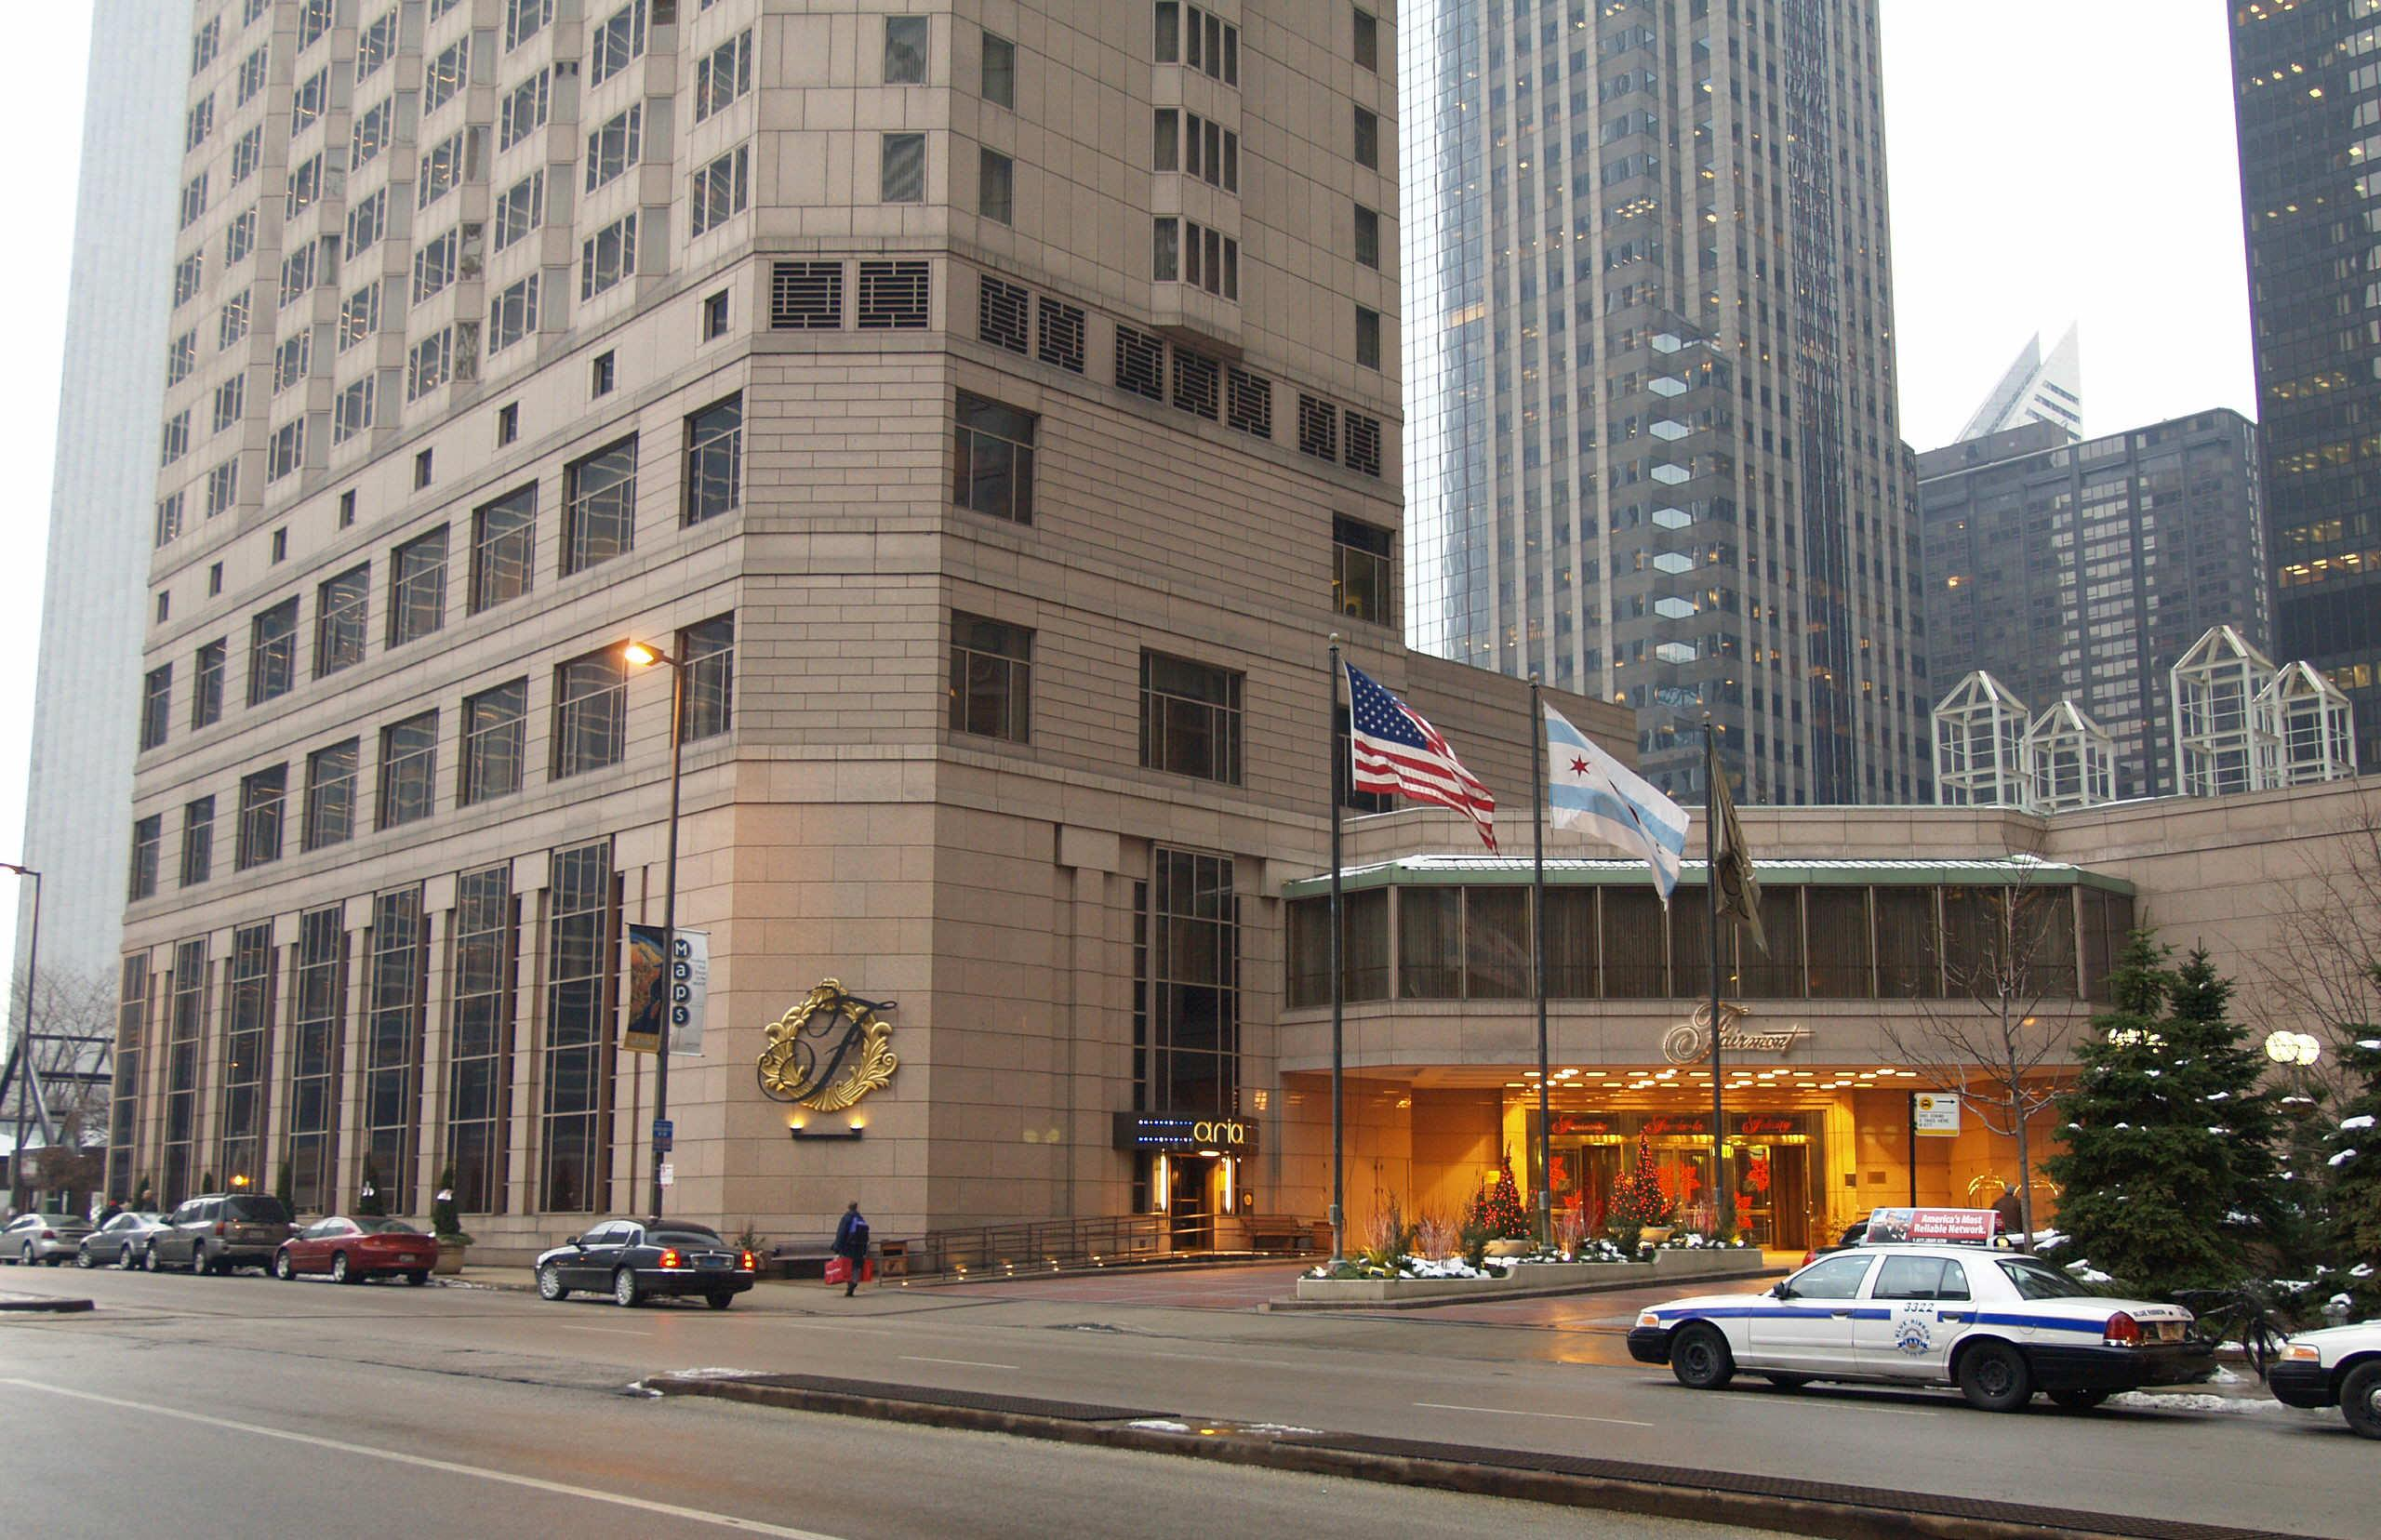 Fairmont chicago millennium park hotel chicago illinois for Chicago lodging